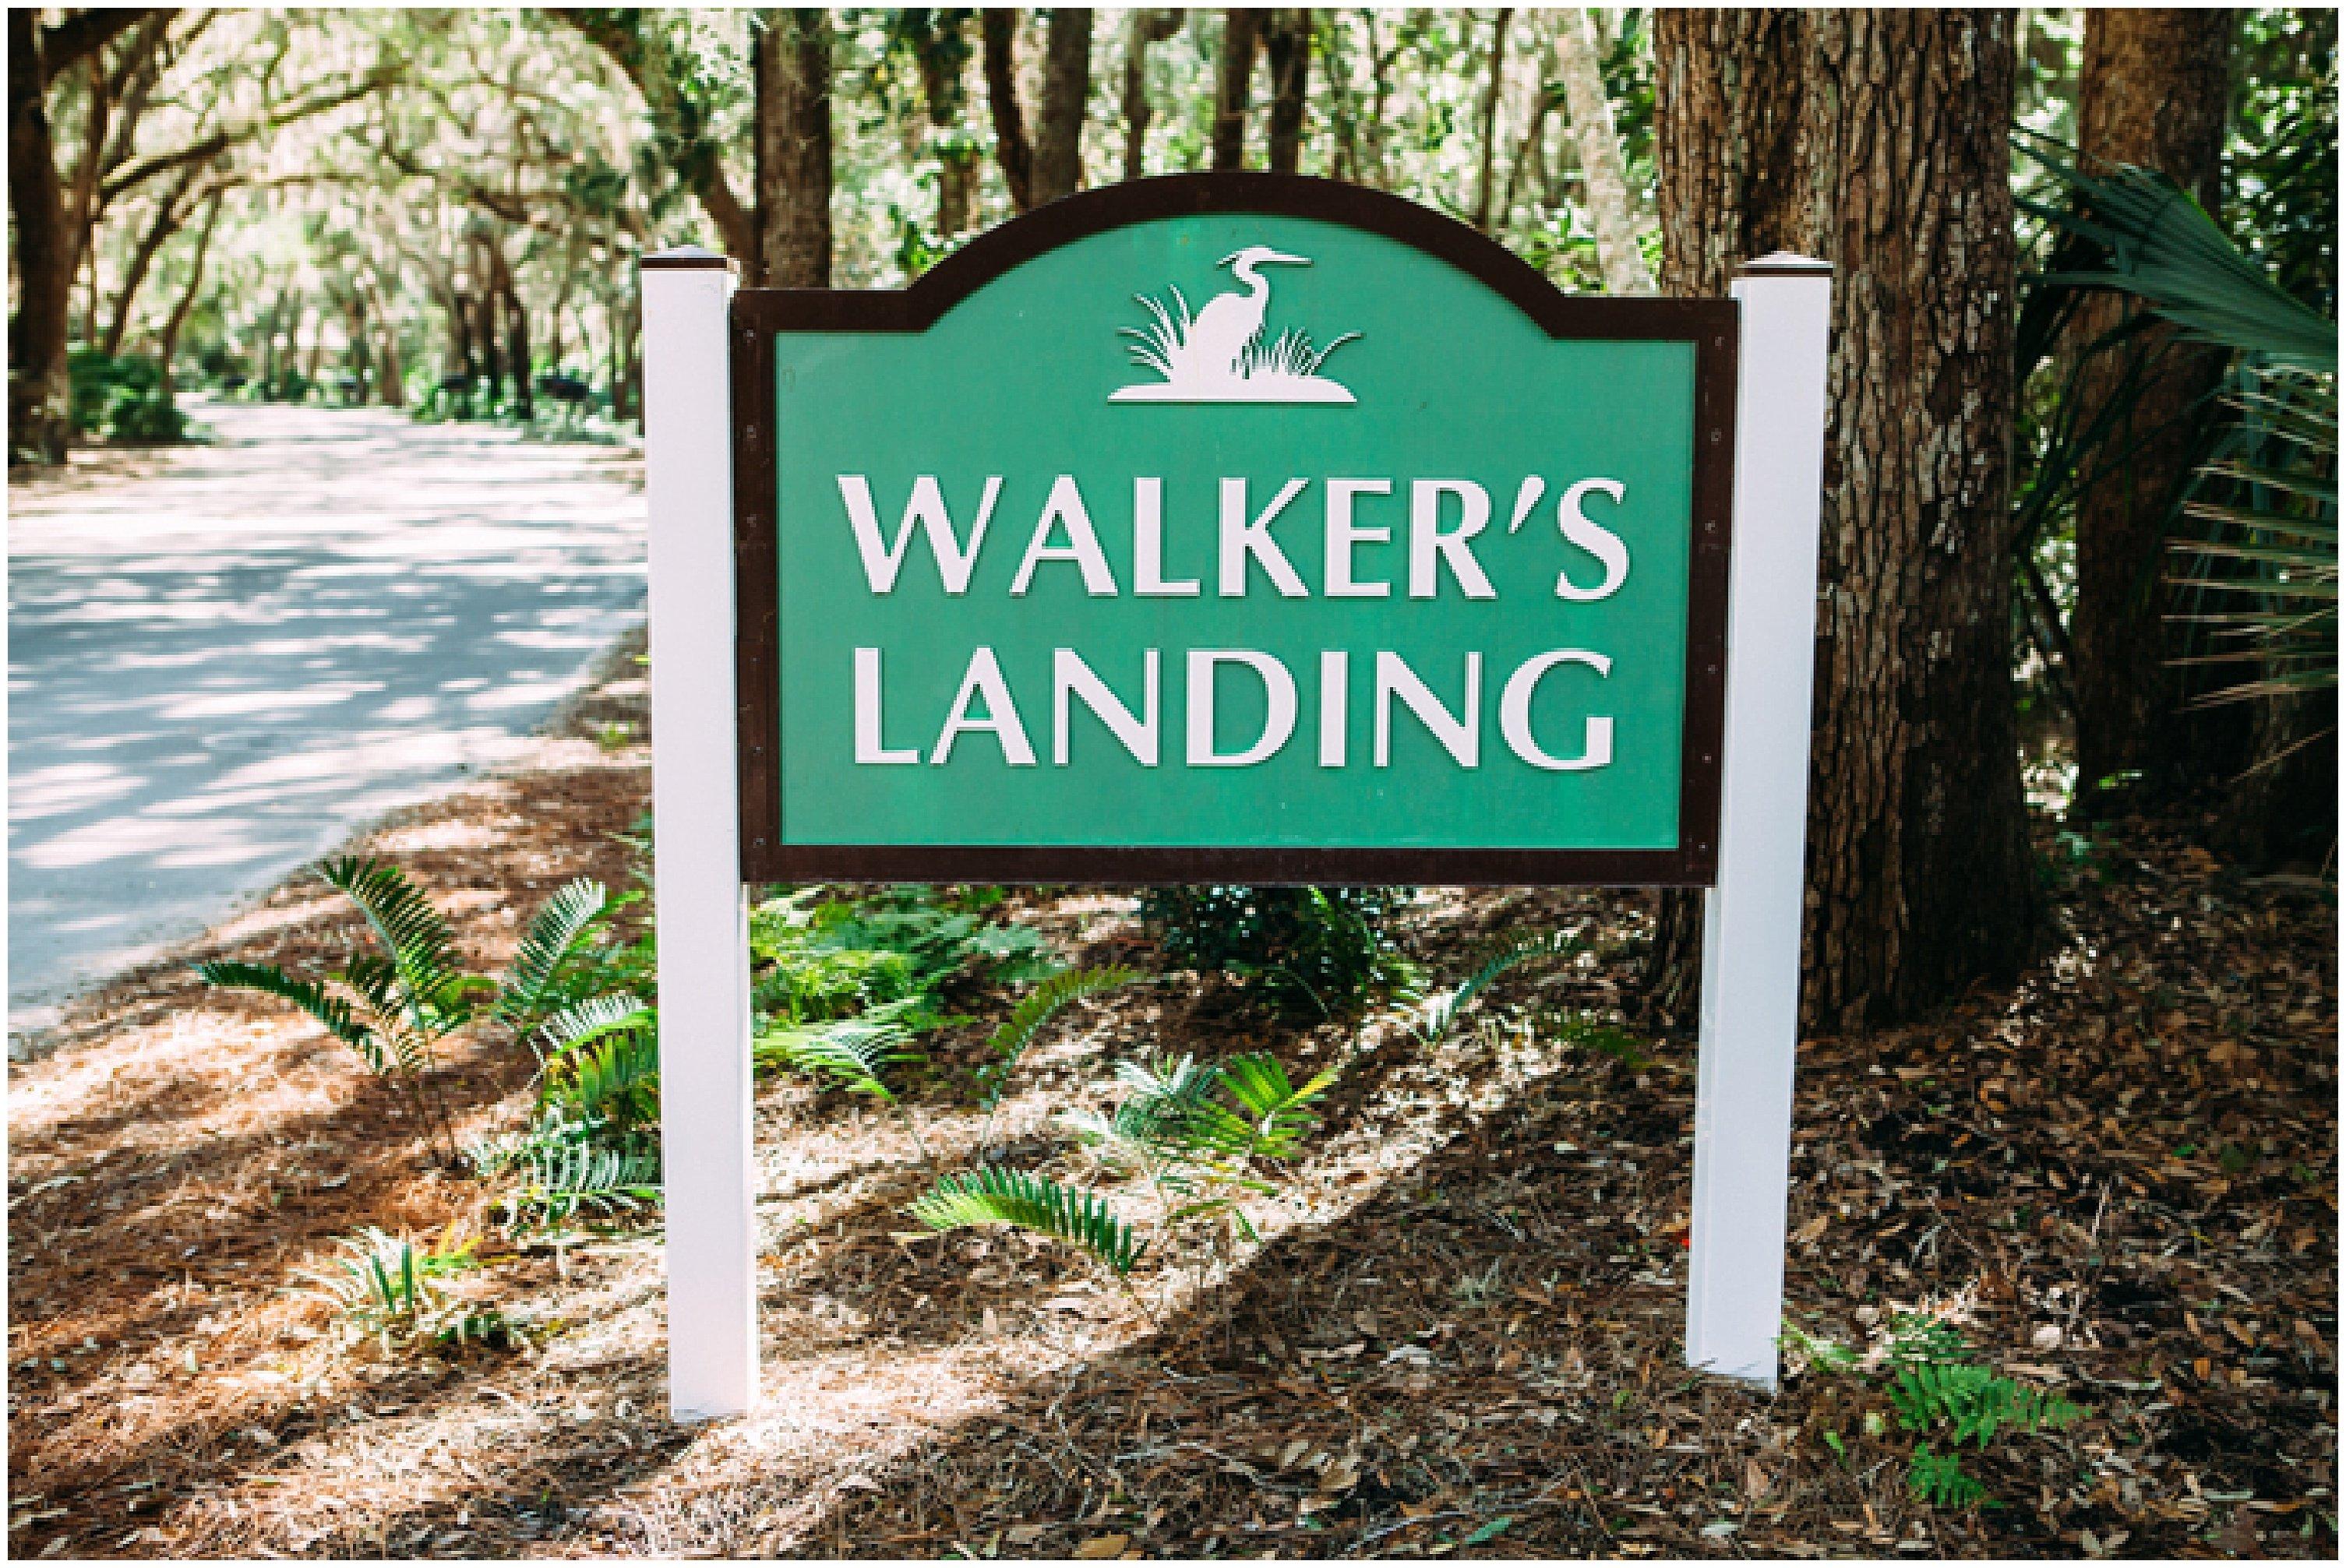 Walkers Landing Building, Omni Amelia Island Plantation